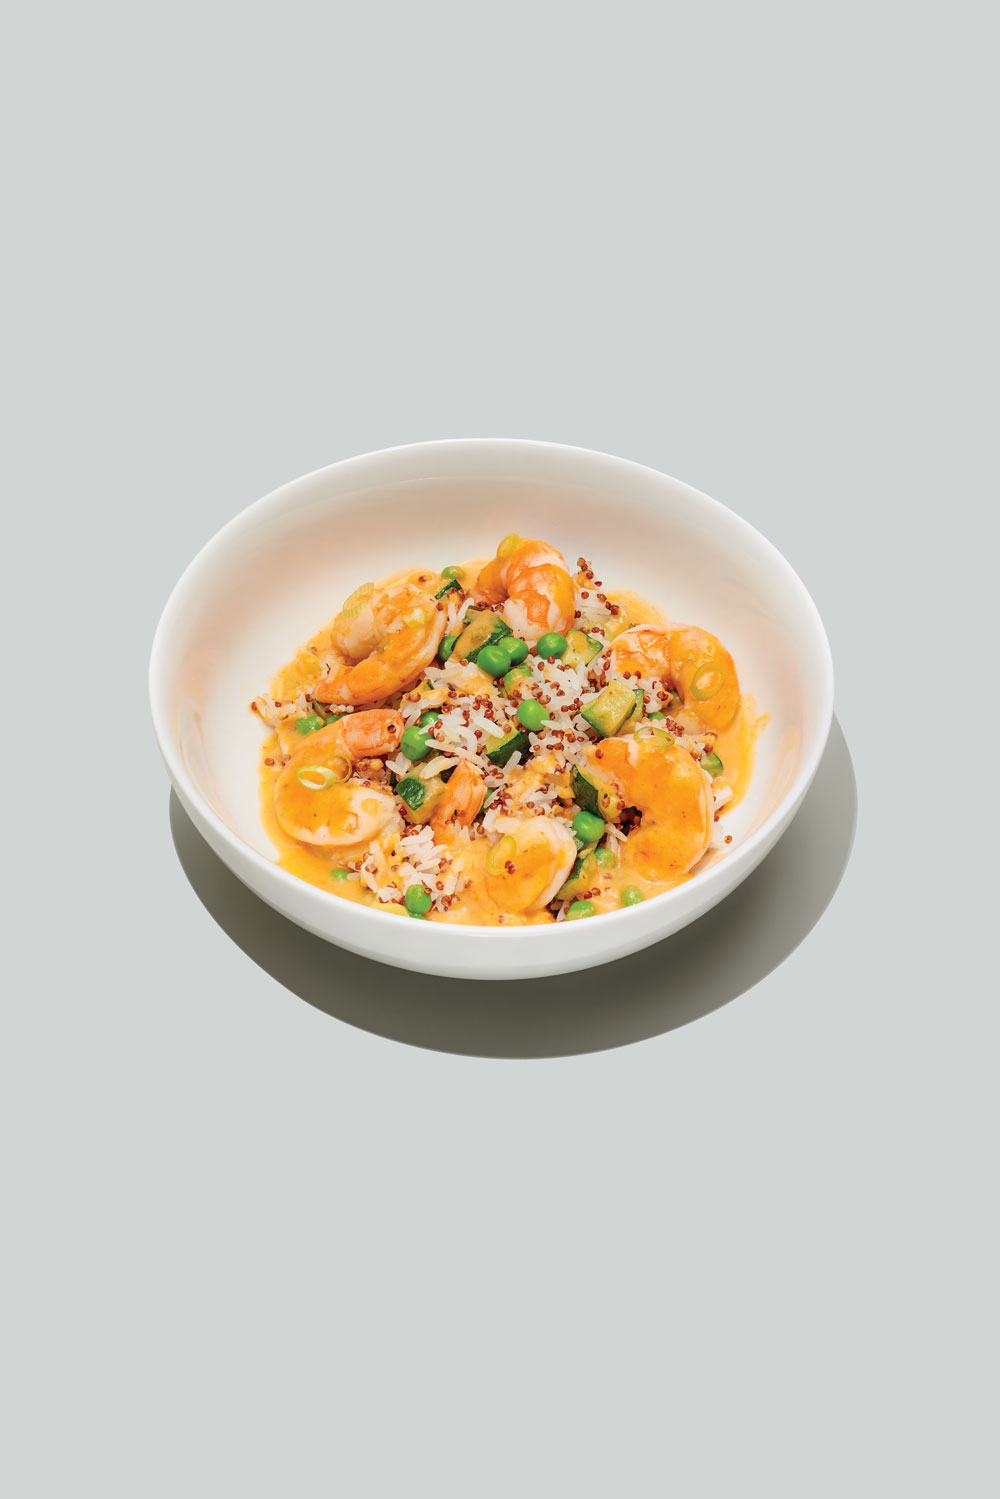 BeMeals-Not-a-Vendind-Machine-Red-Curry-Shrimp